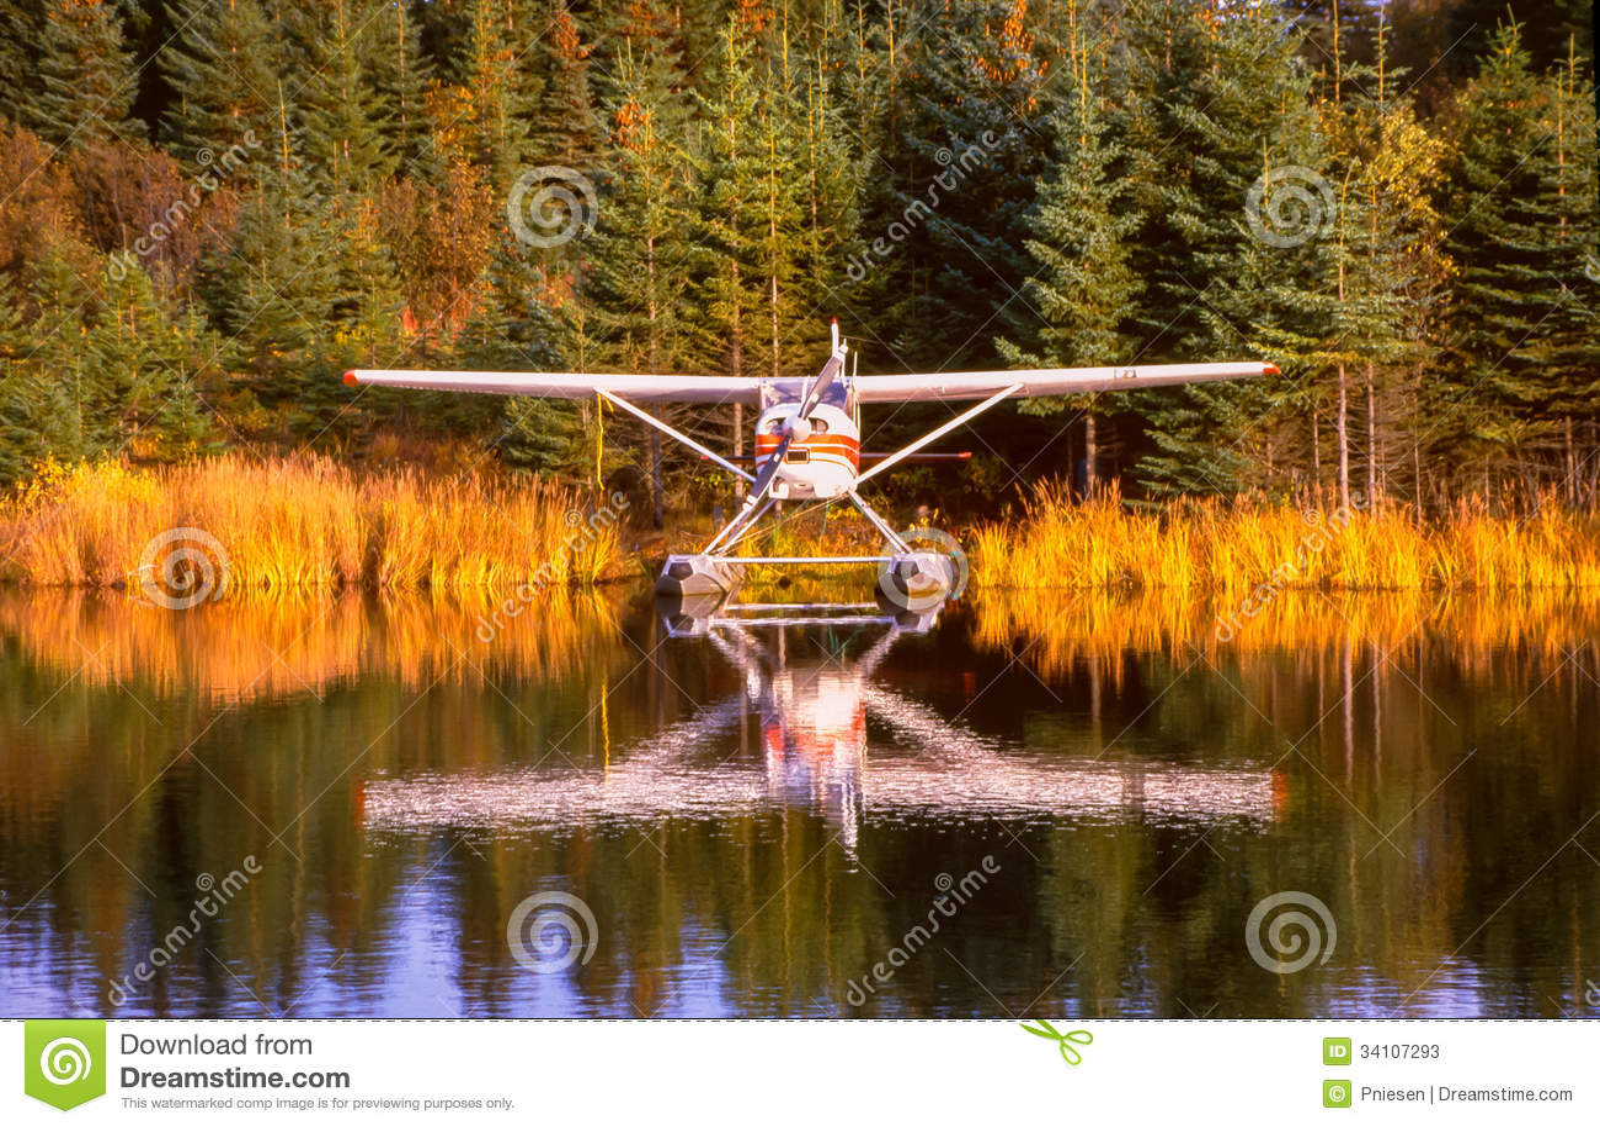 Fall Foliage Hd Wallpaper Alaska Float Plane Moored At Dock Amid Foliage Reflections